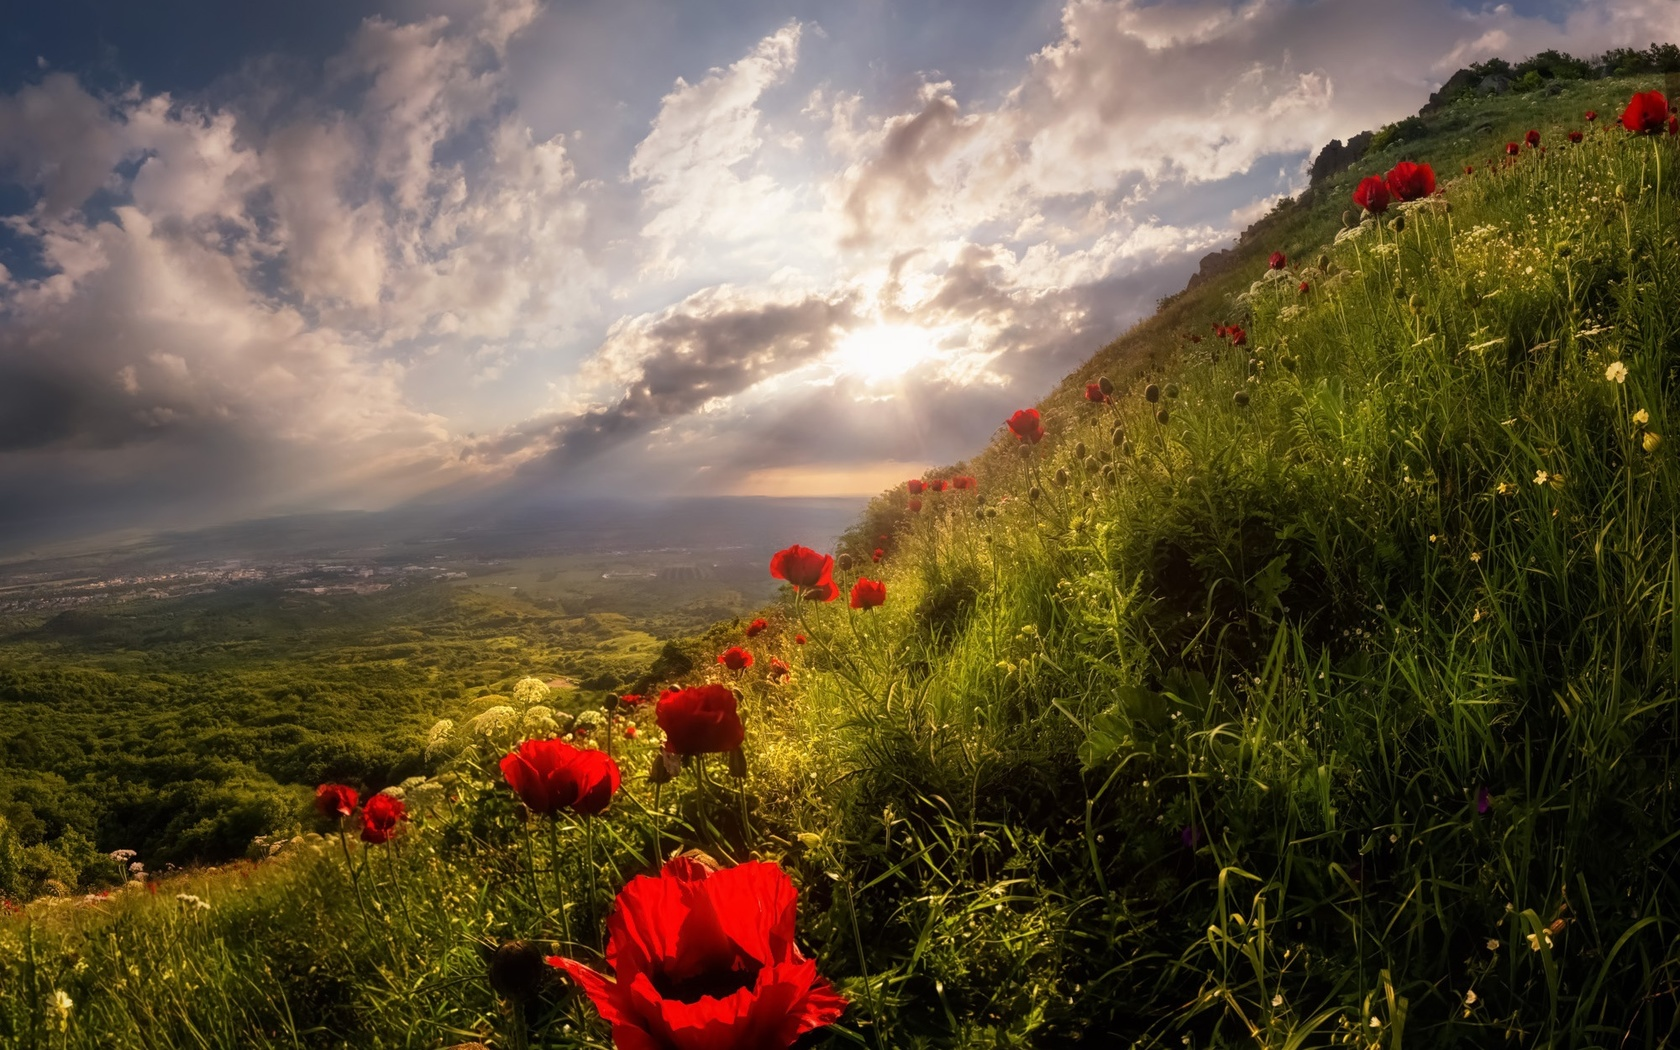 природа, лето, склон, цветы, маки, облака, солнце, лучи, пейзаж